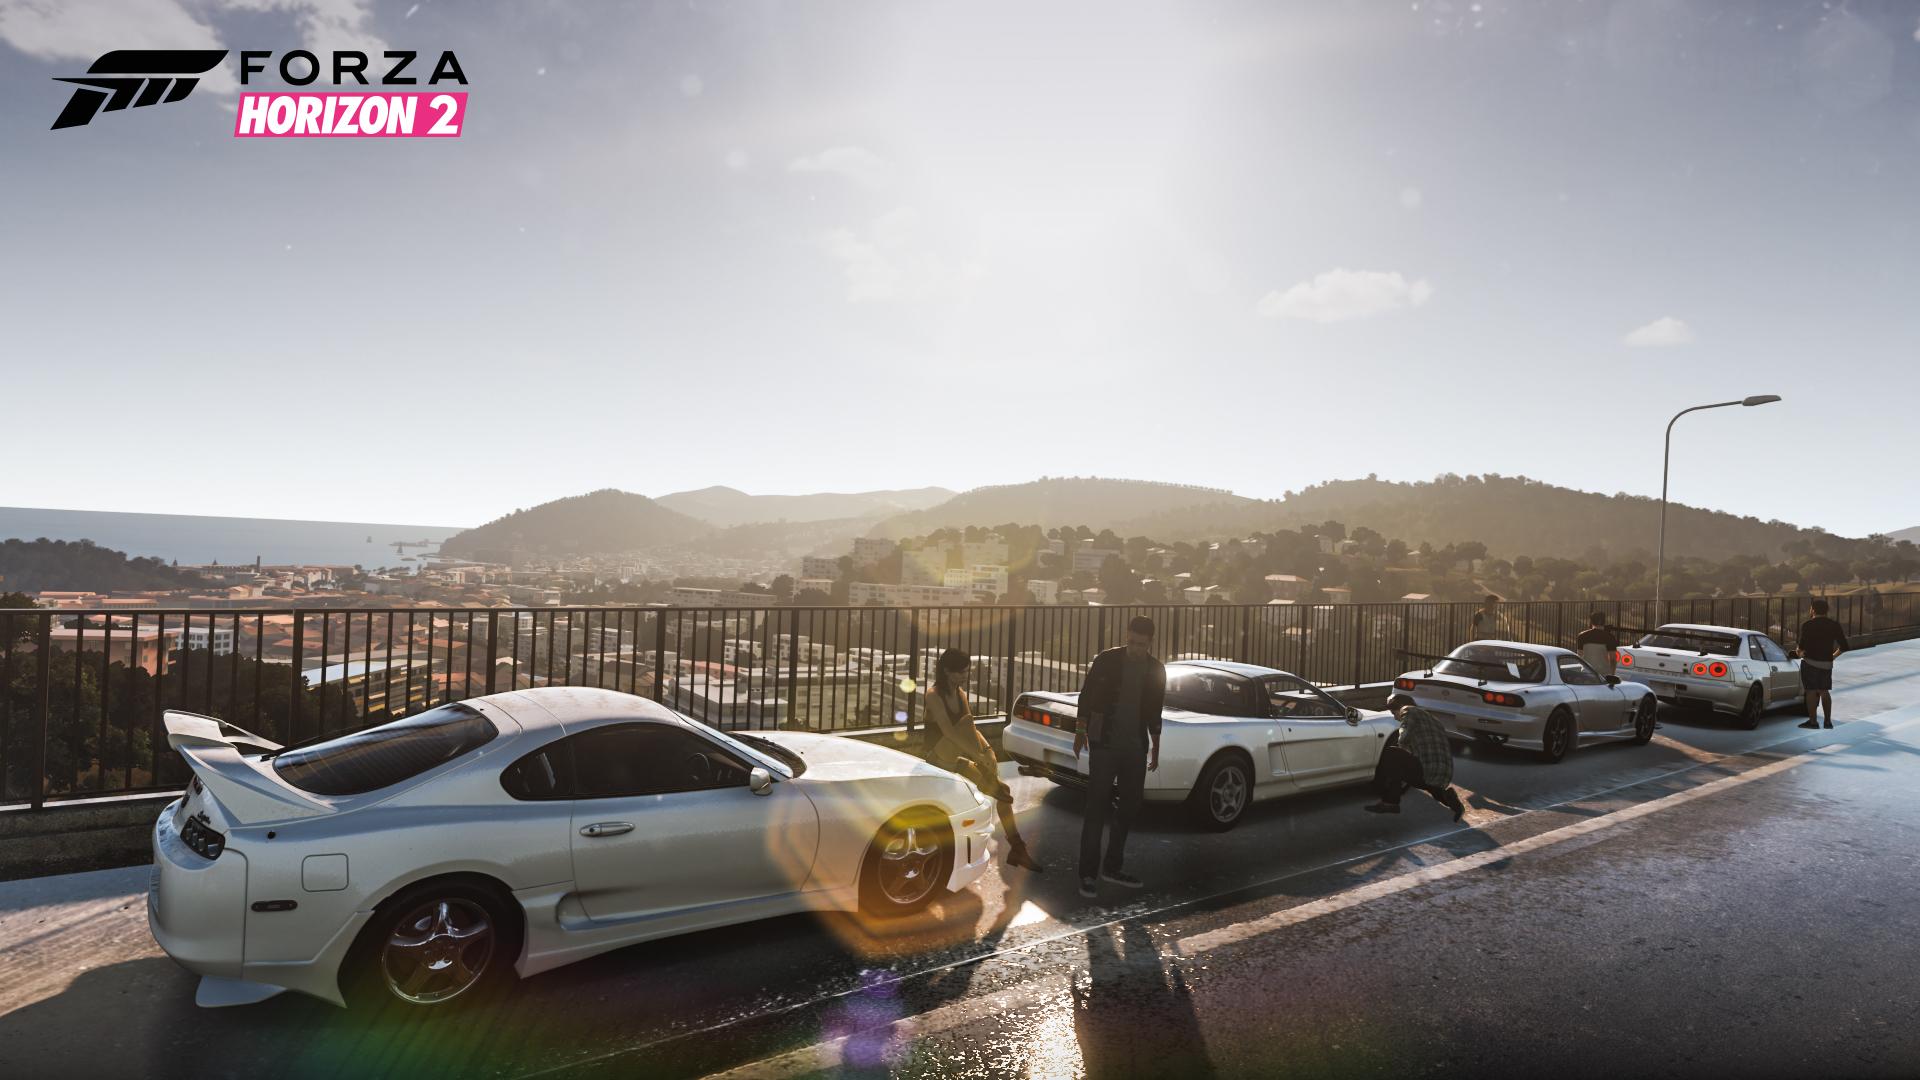 Forza Horizon 3 Background: Forza Horizon 2 HD Wallpaper